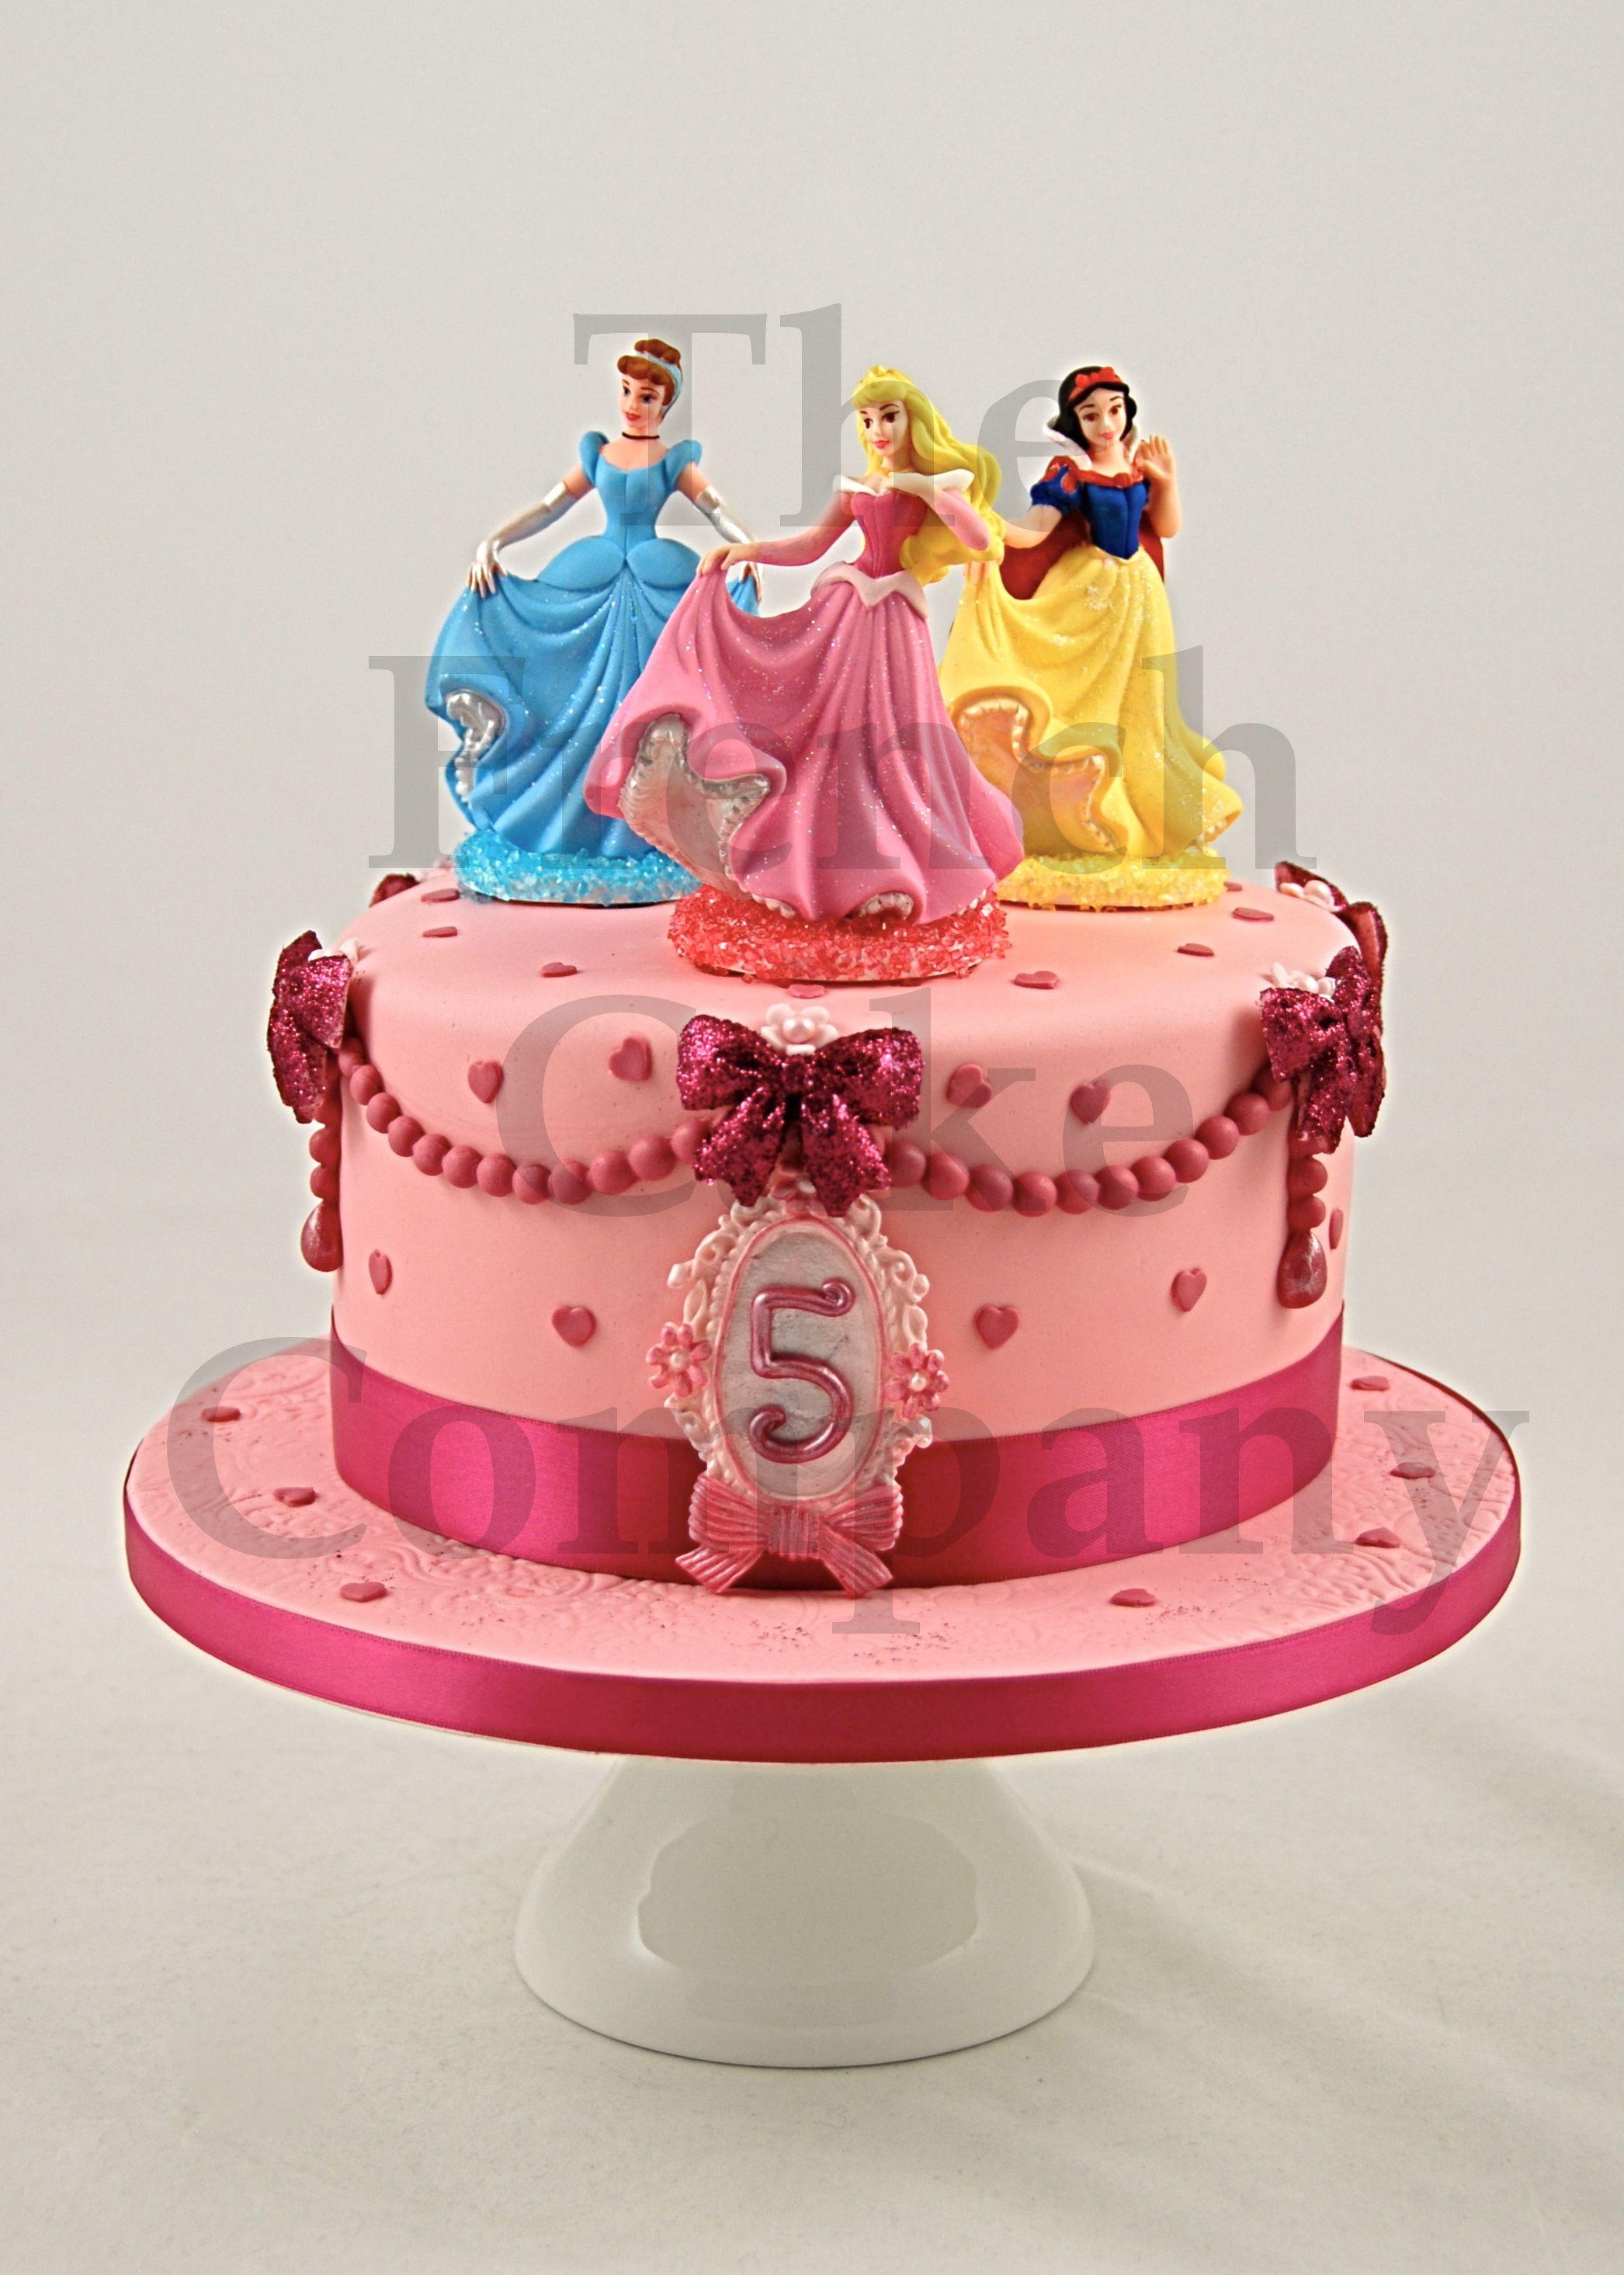 cakes for girls gateau d 39 anniversaire pour enfants filles verjaardagstaart cakes for girls. Black Bedroom Furniture Sets. Home Design Ideas